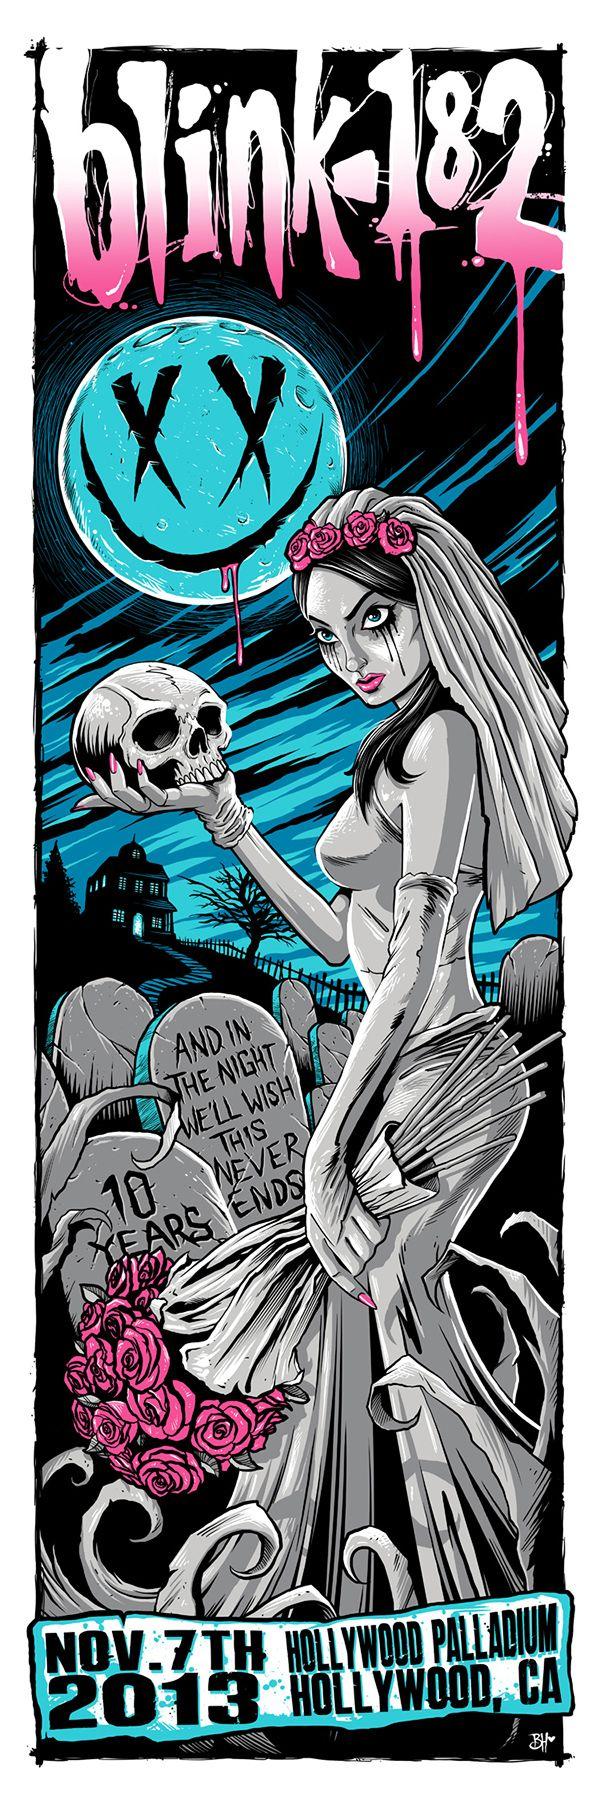 Blink-182 Hollywood Palladium 2013 Poster on Behance